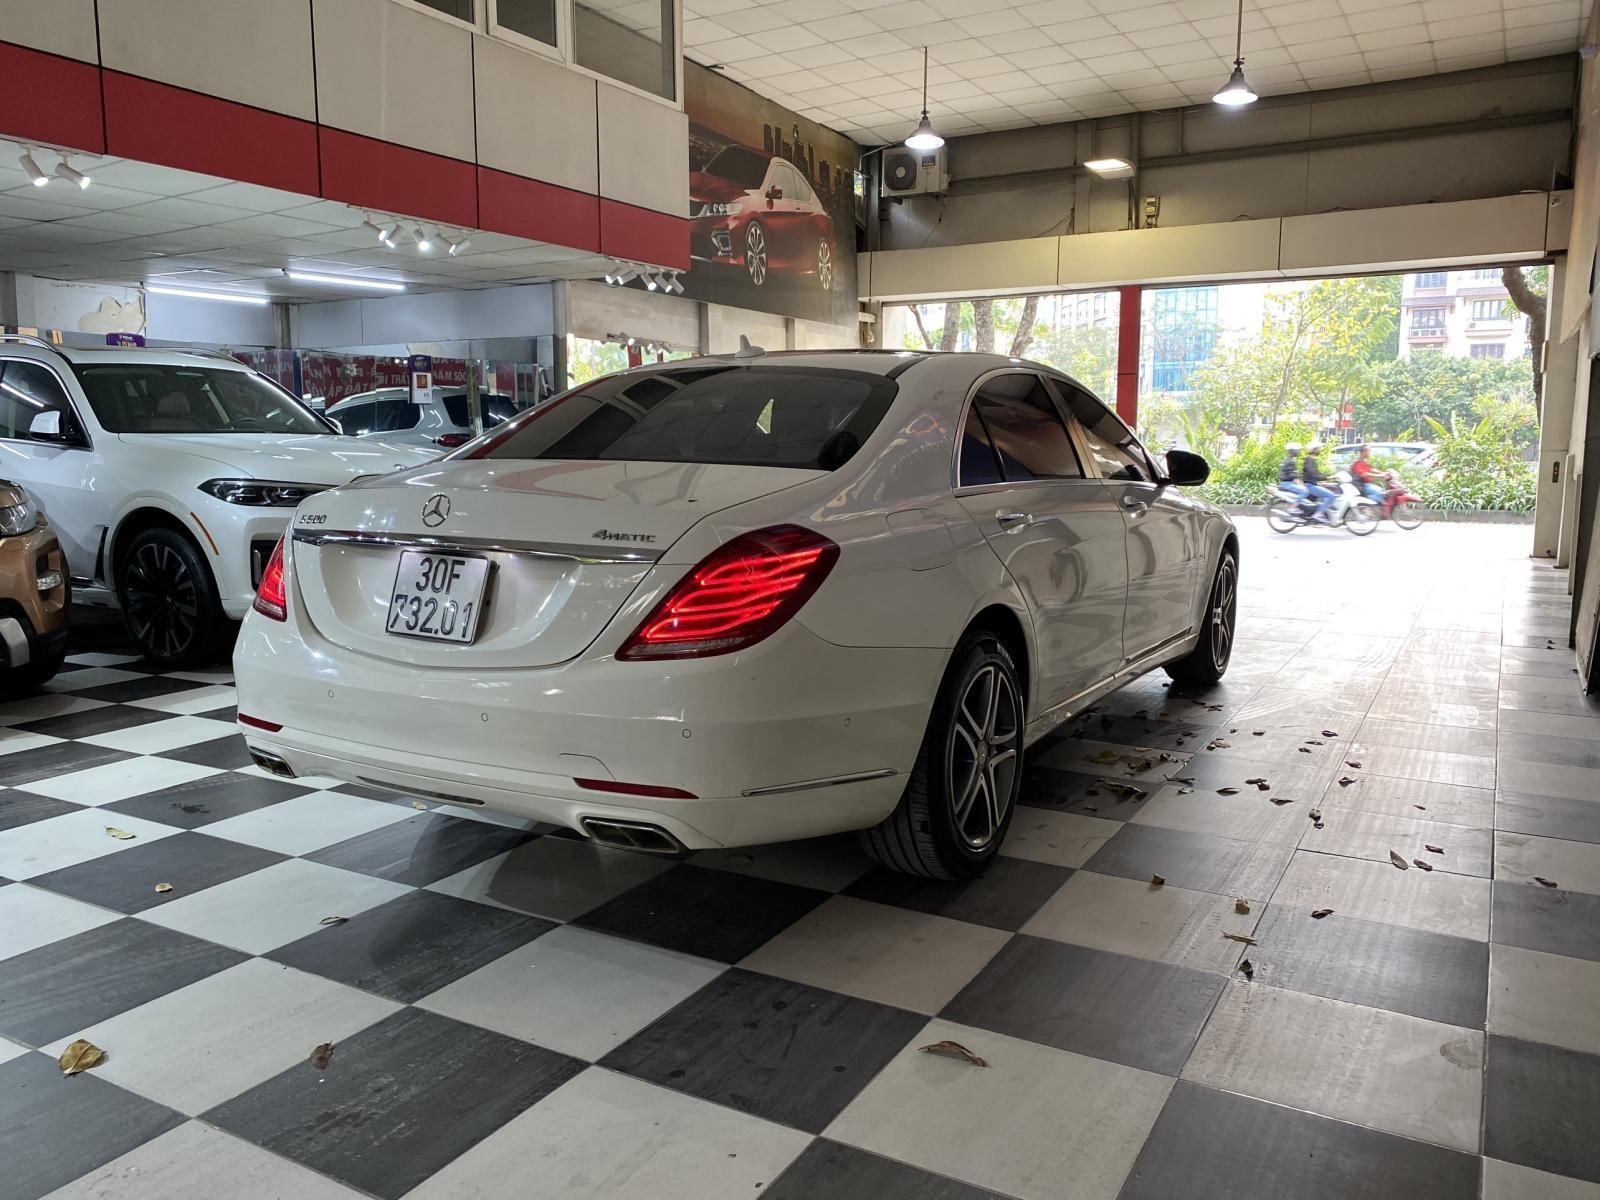 Bán Mercedes Benz S400 4matic 2016